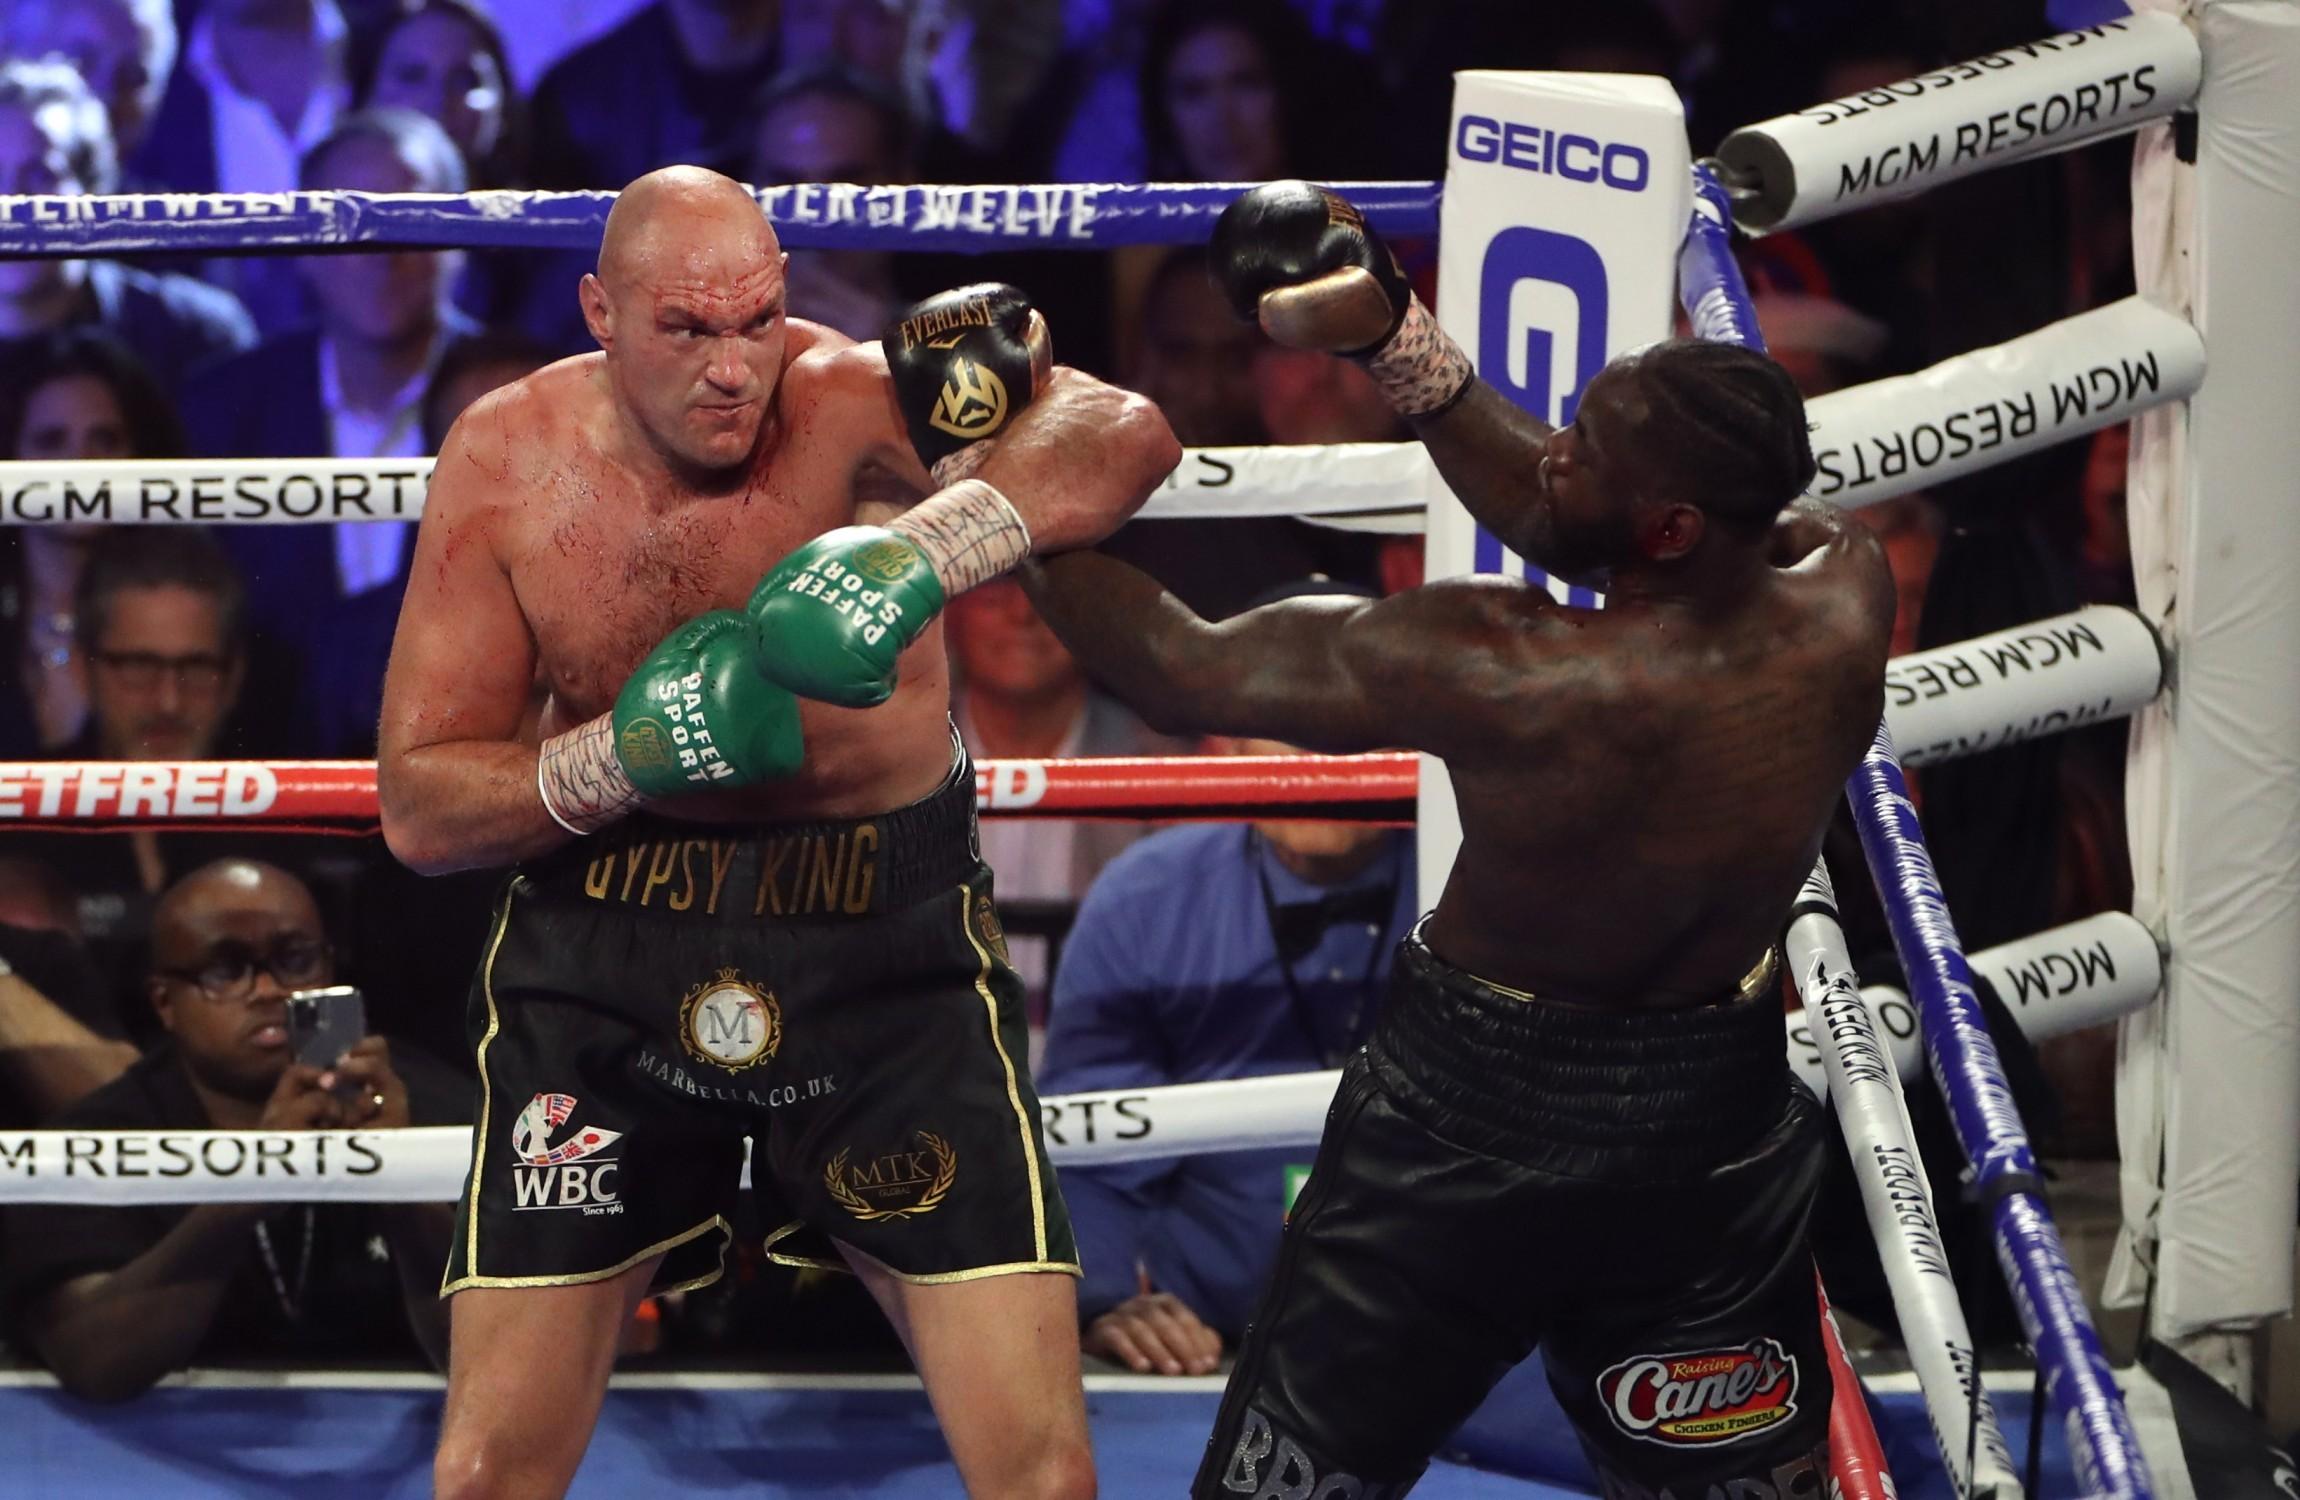 Tyson Fury's next fight won't be vs. Deontay Wilder, Bob Arum says